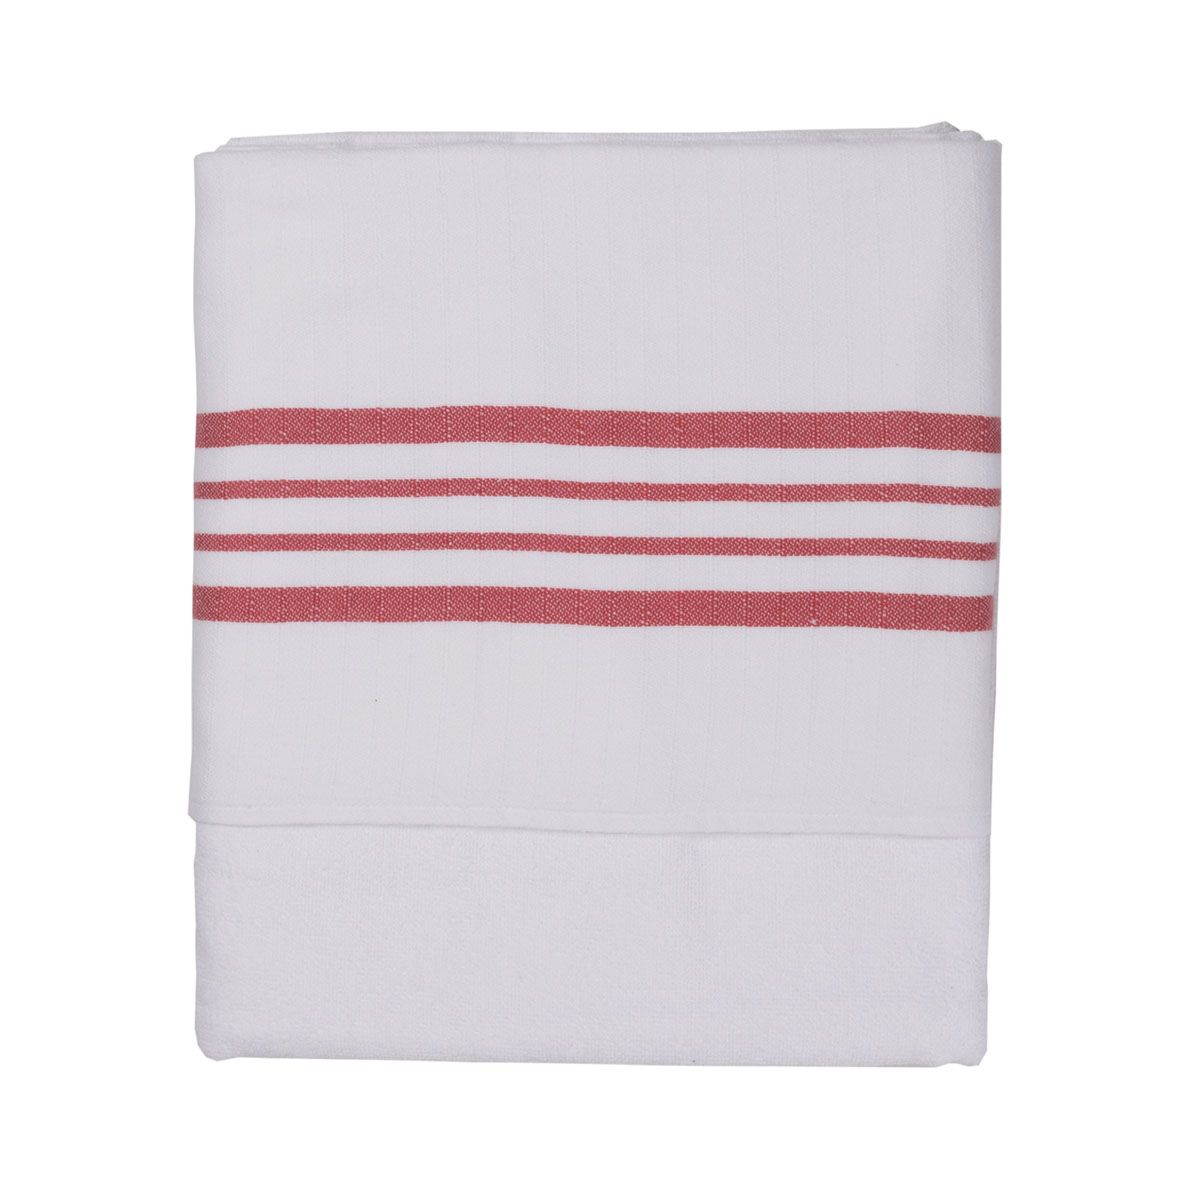 Peshtowel White Sultan - Double Face / Dusty Rose Stripes